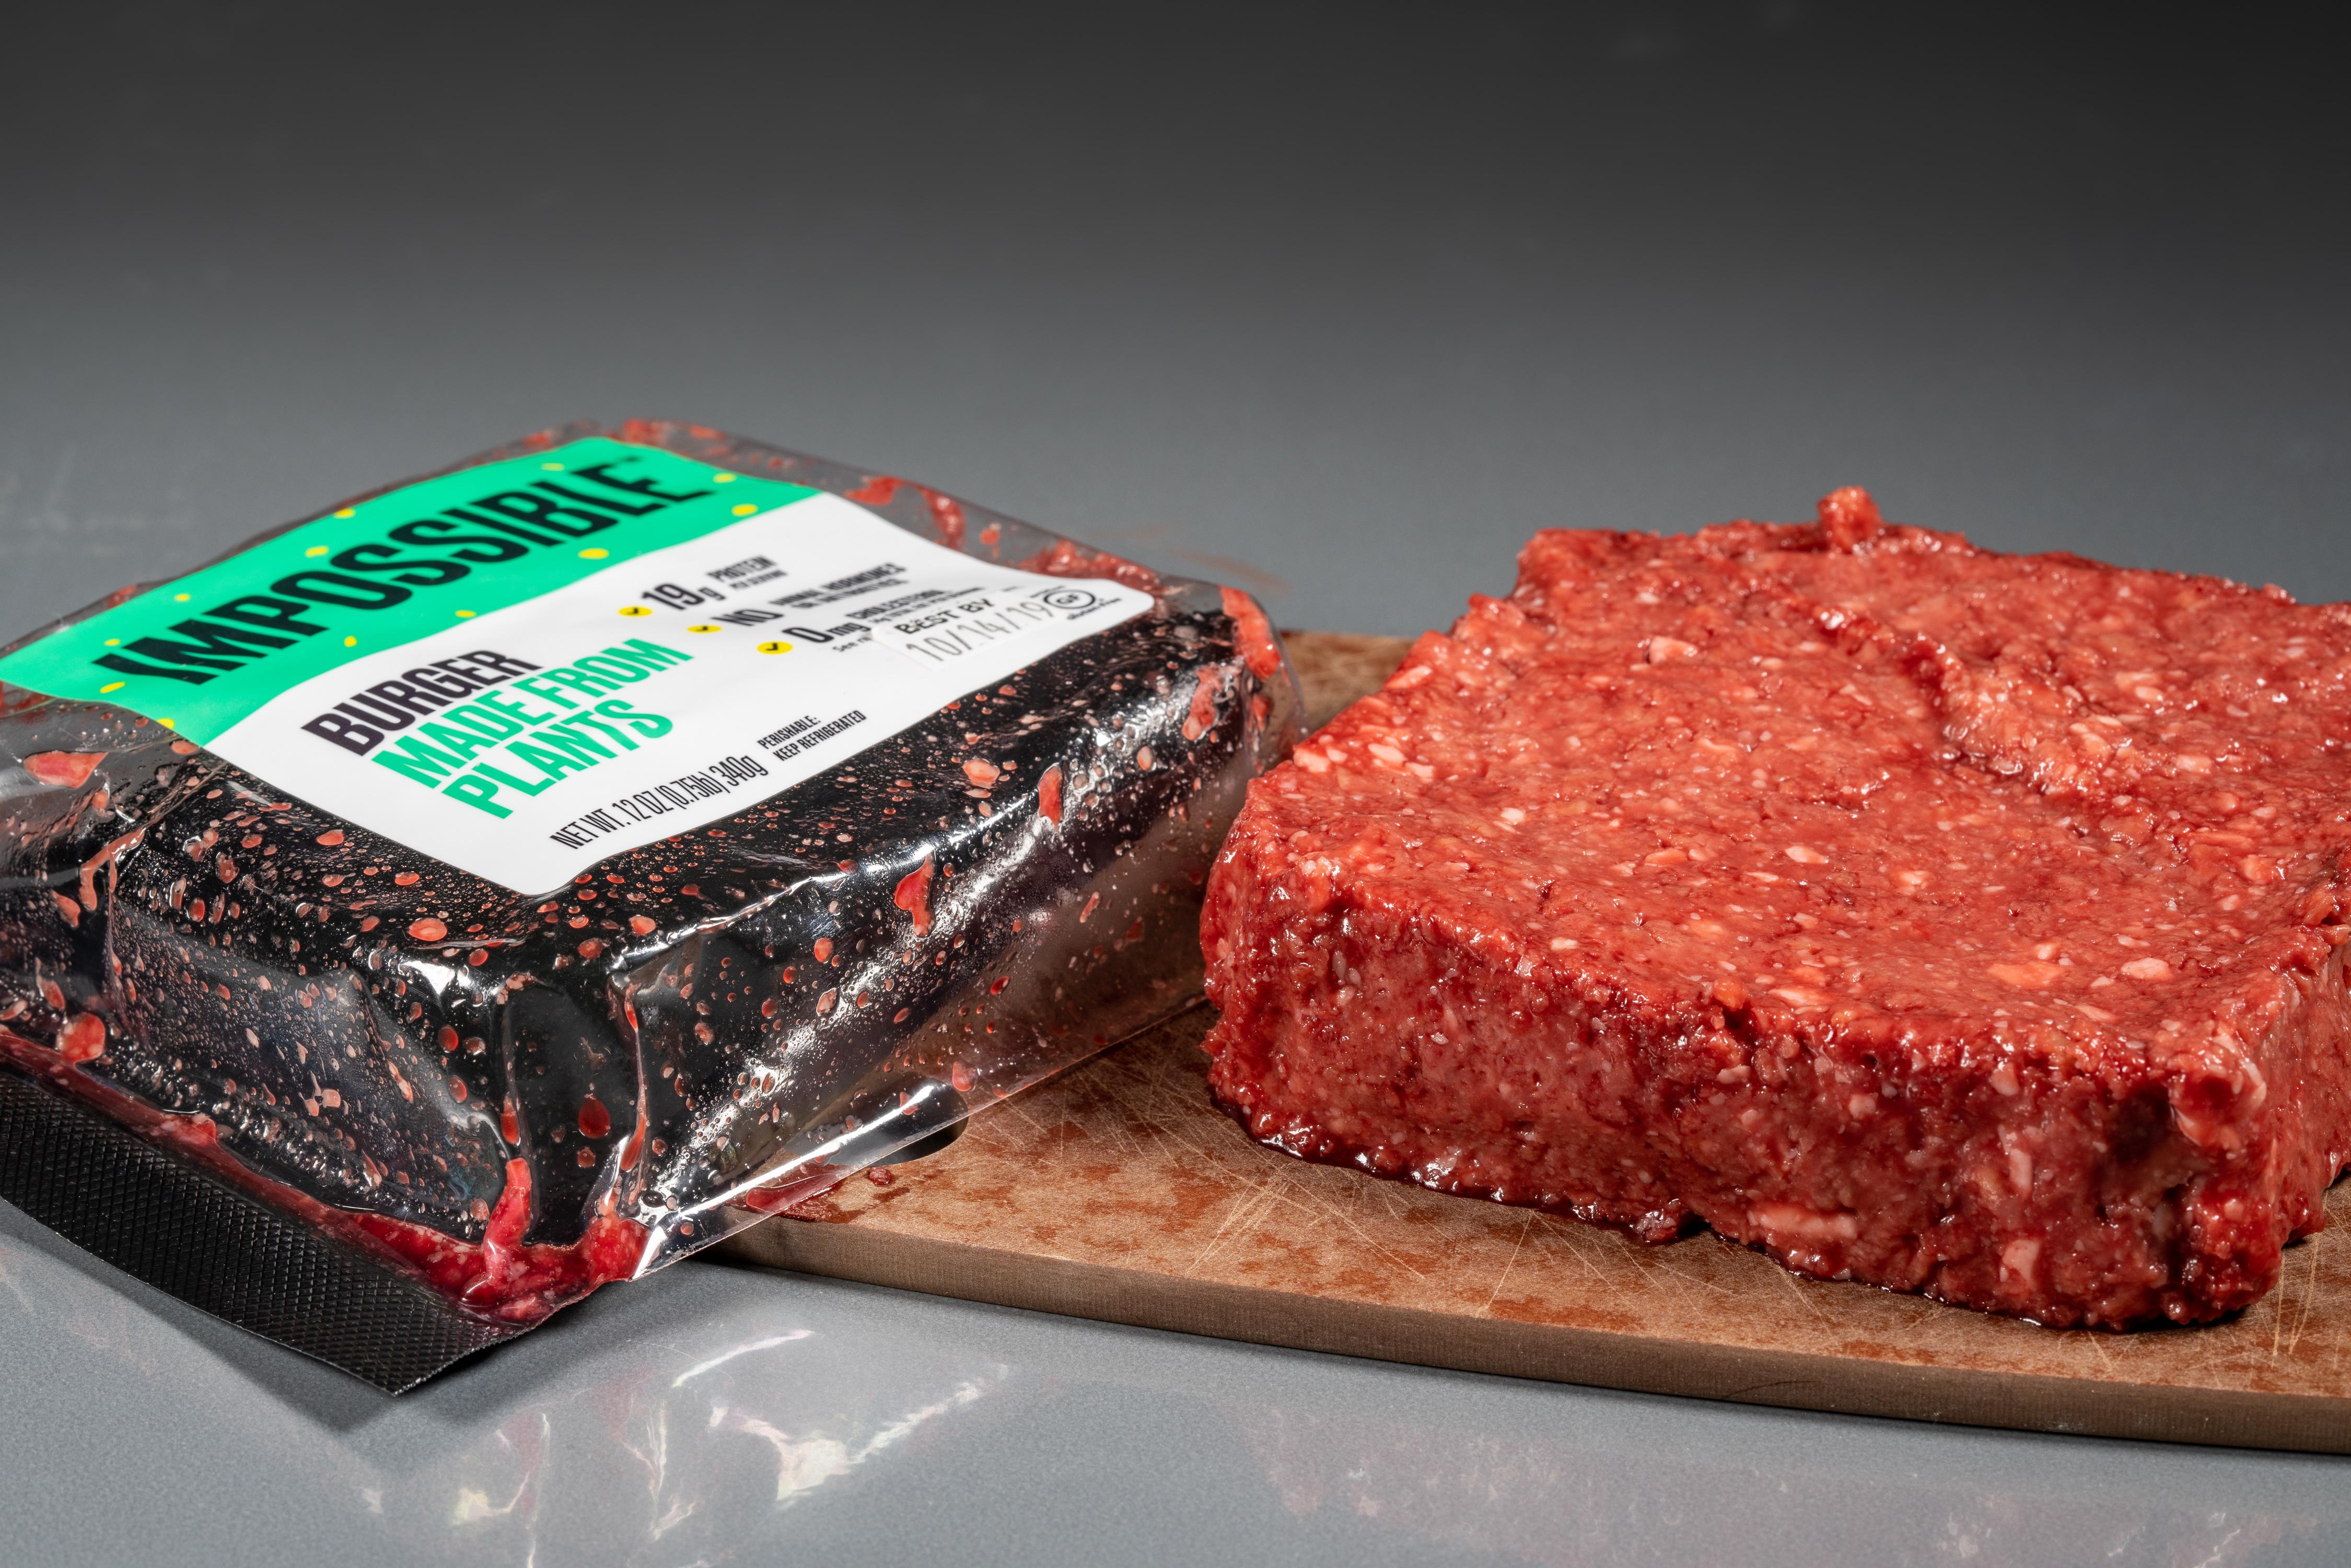 IMPOSSIBLE BURGER MEAT, PHOTO ADOBE ACRONYM